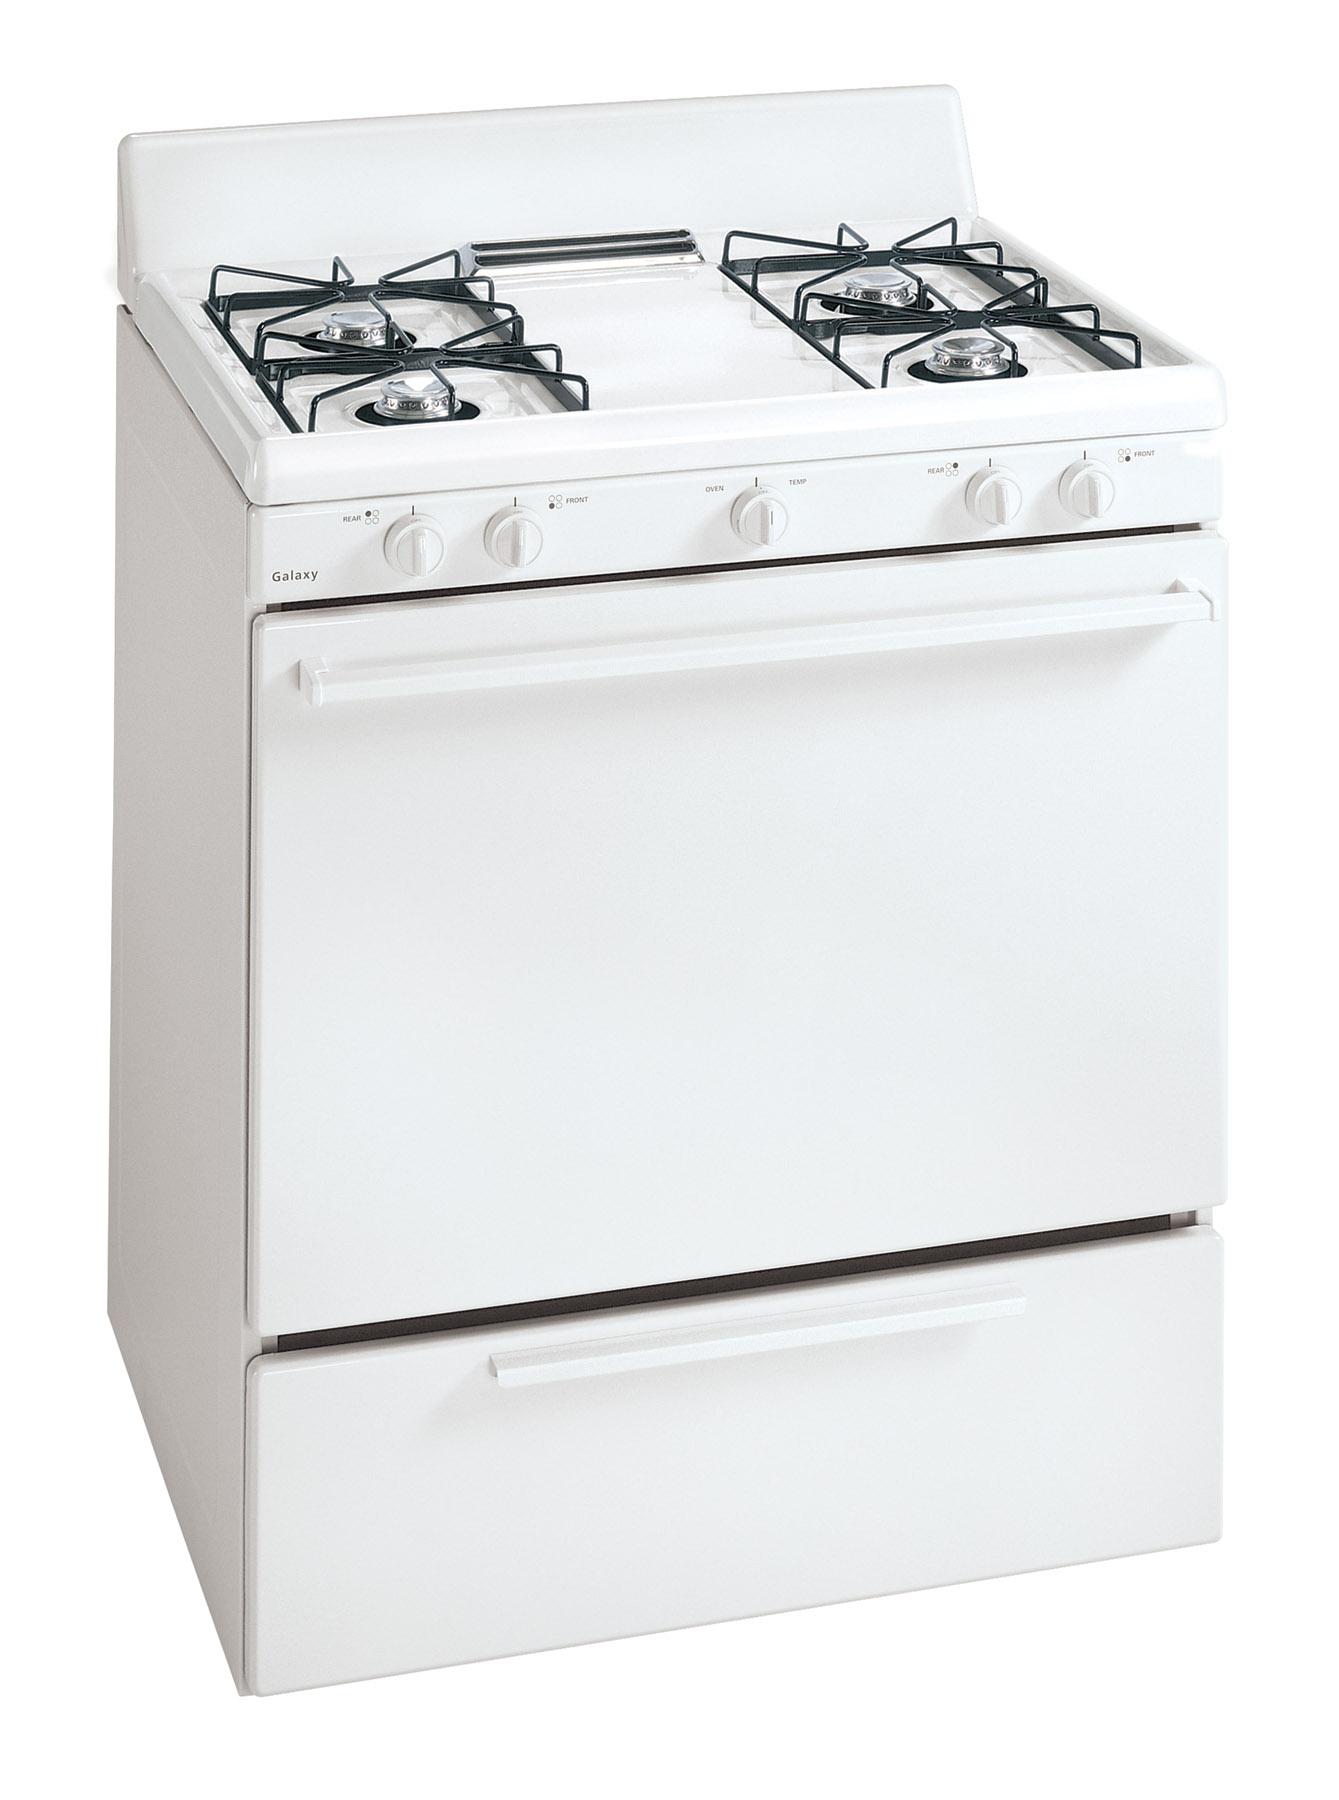 Kenmore Range/Stove/Oven Model 790.60012600 Parts